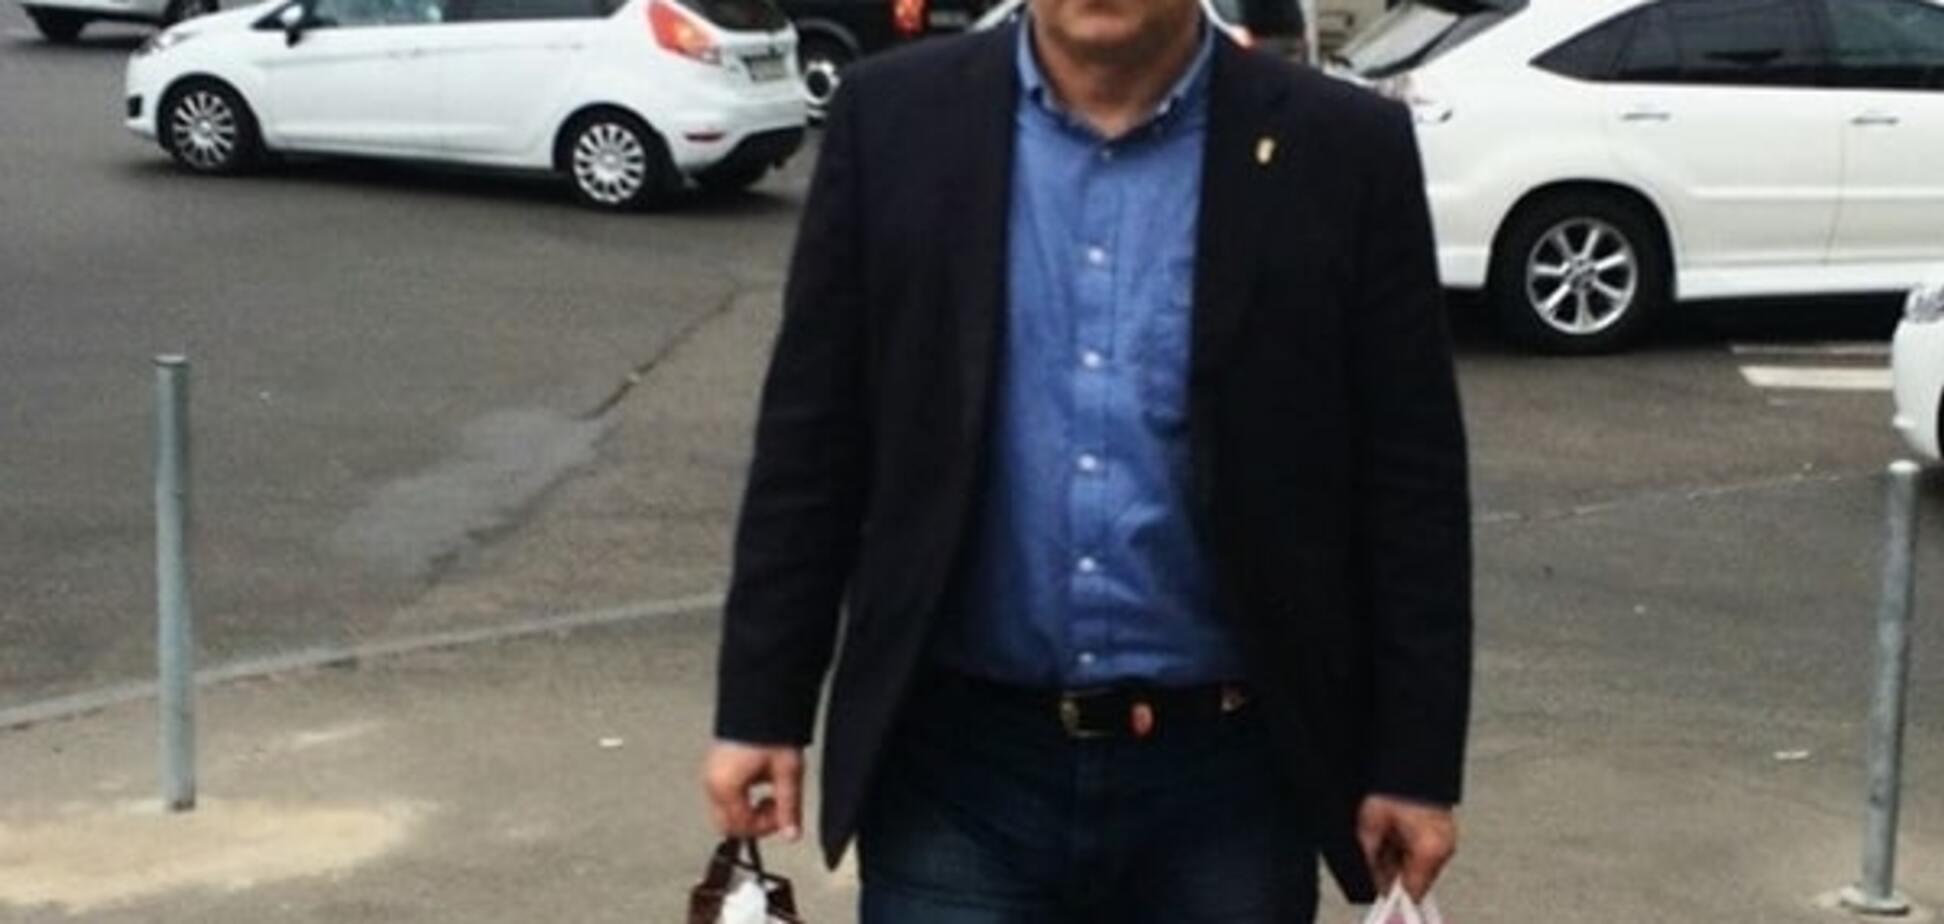 Однопартиец-миллионер внес два 'мешка' денег за Швайку: фотофакт